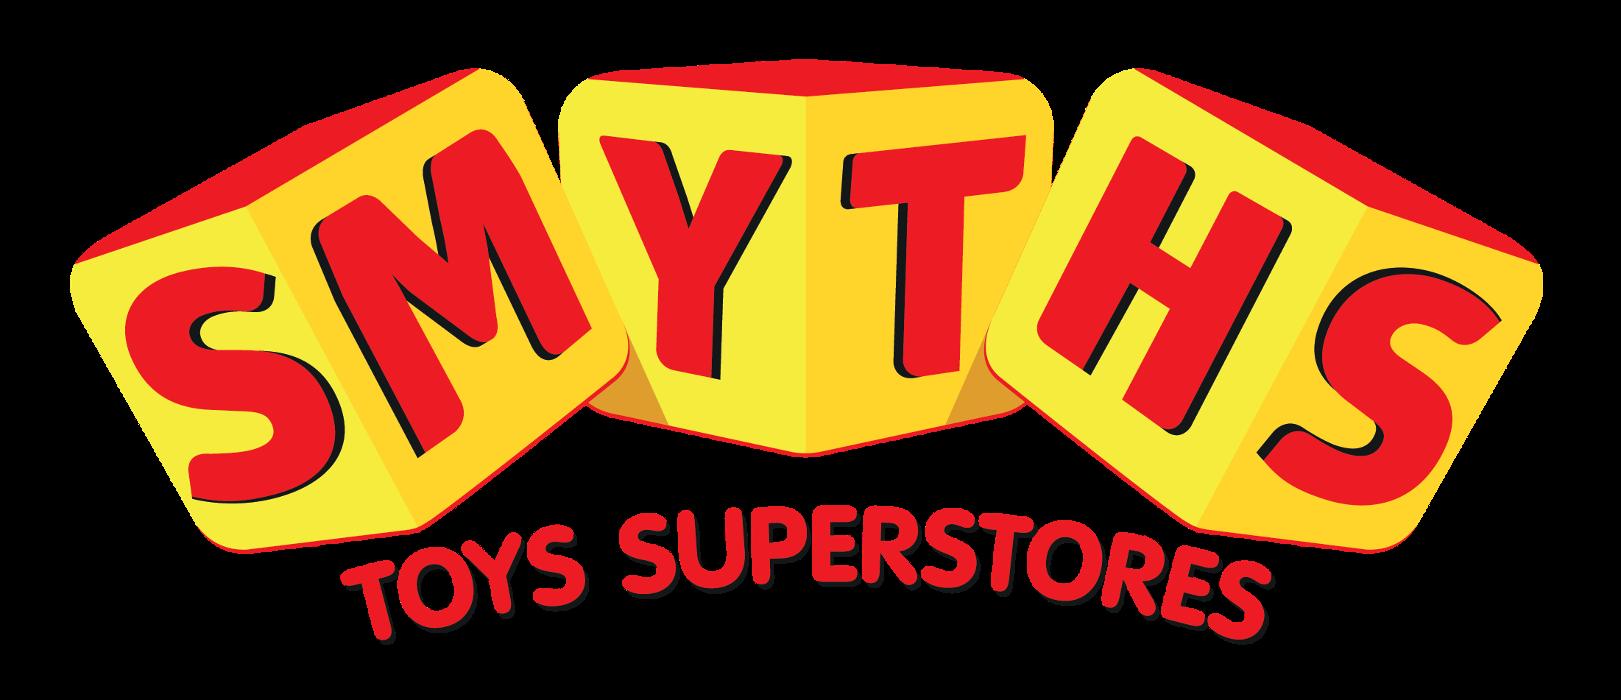 Smyths Toys Superstores in Duisburg